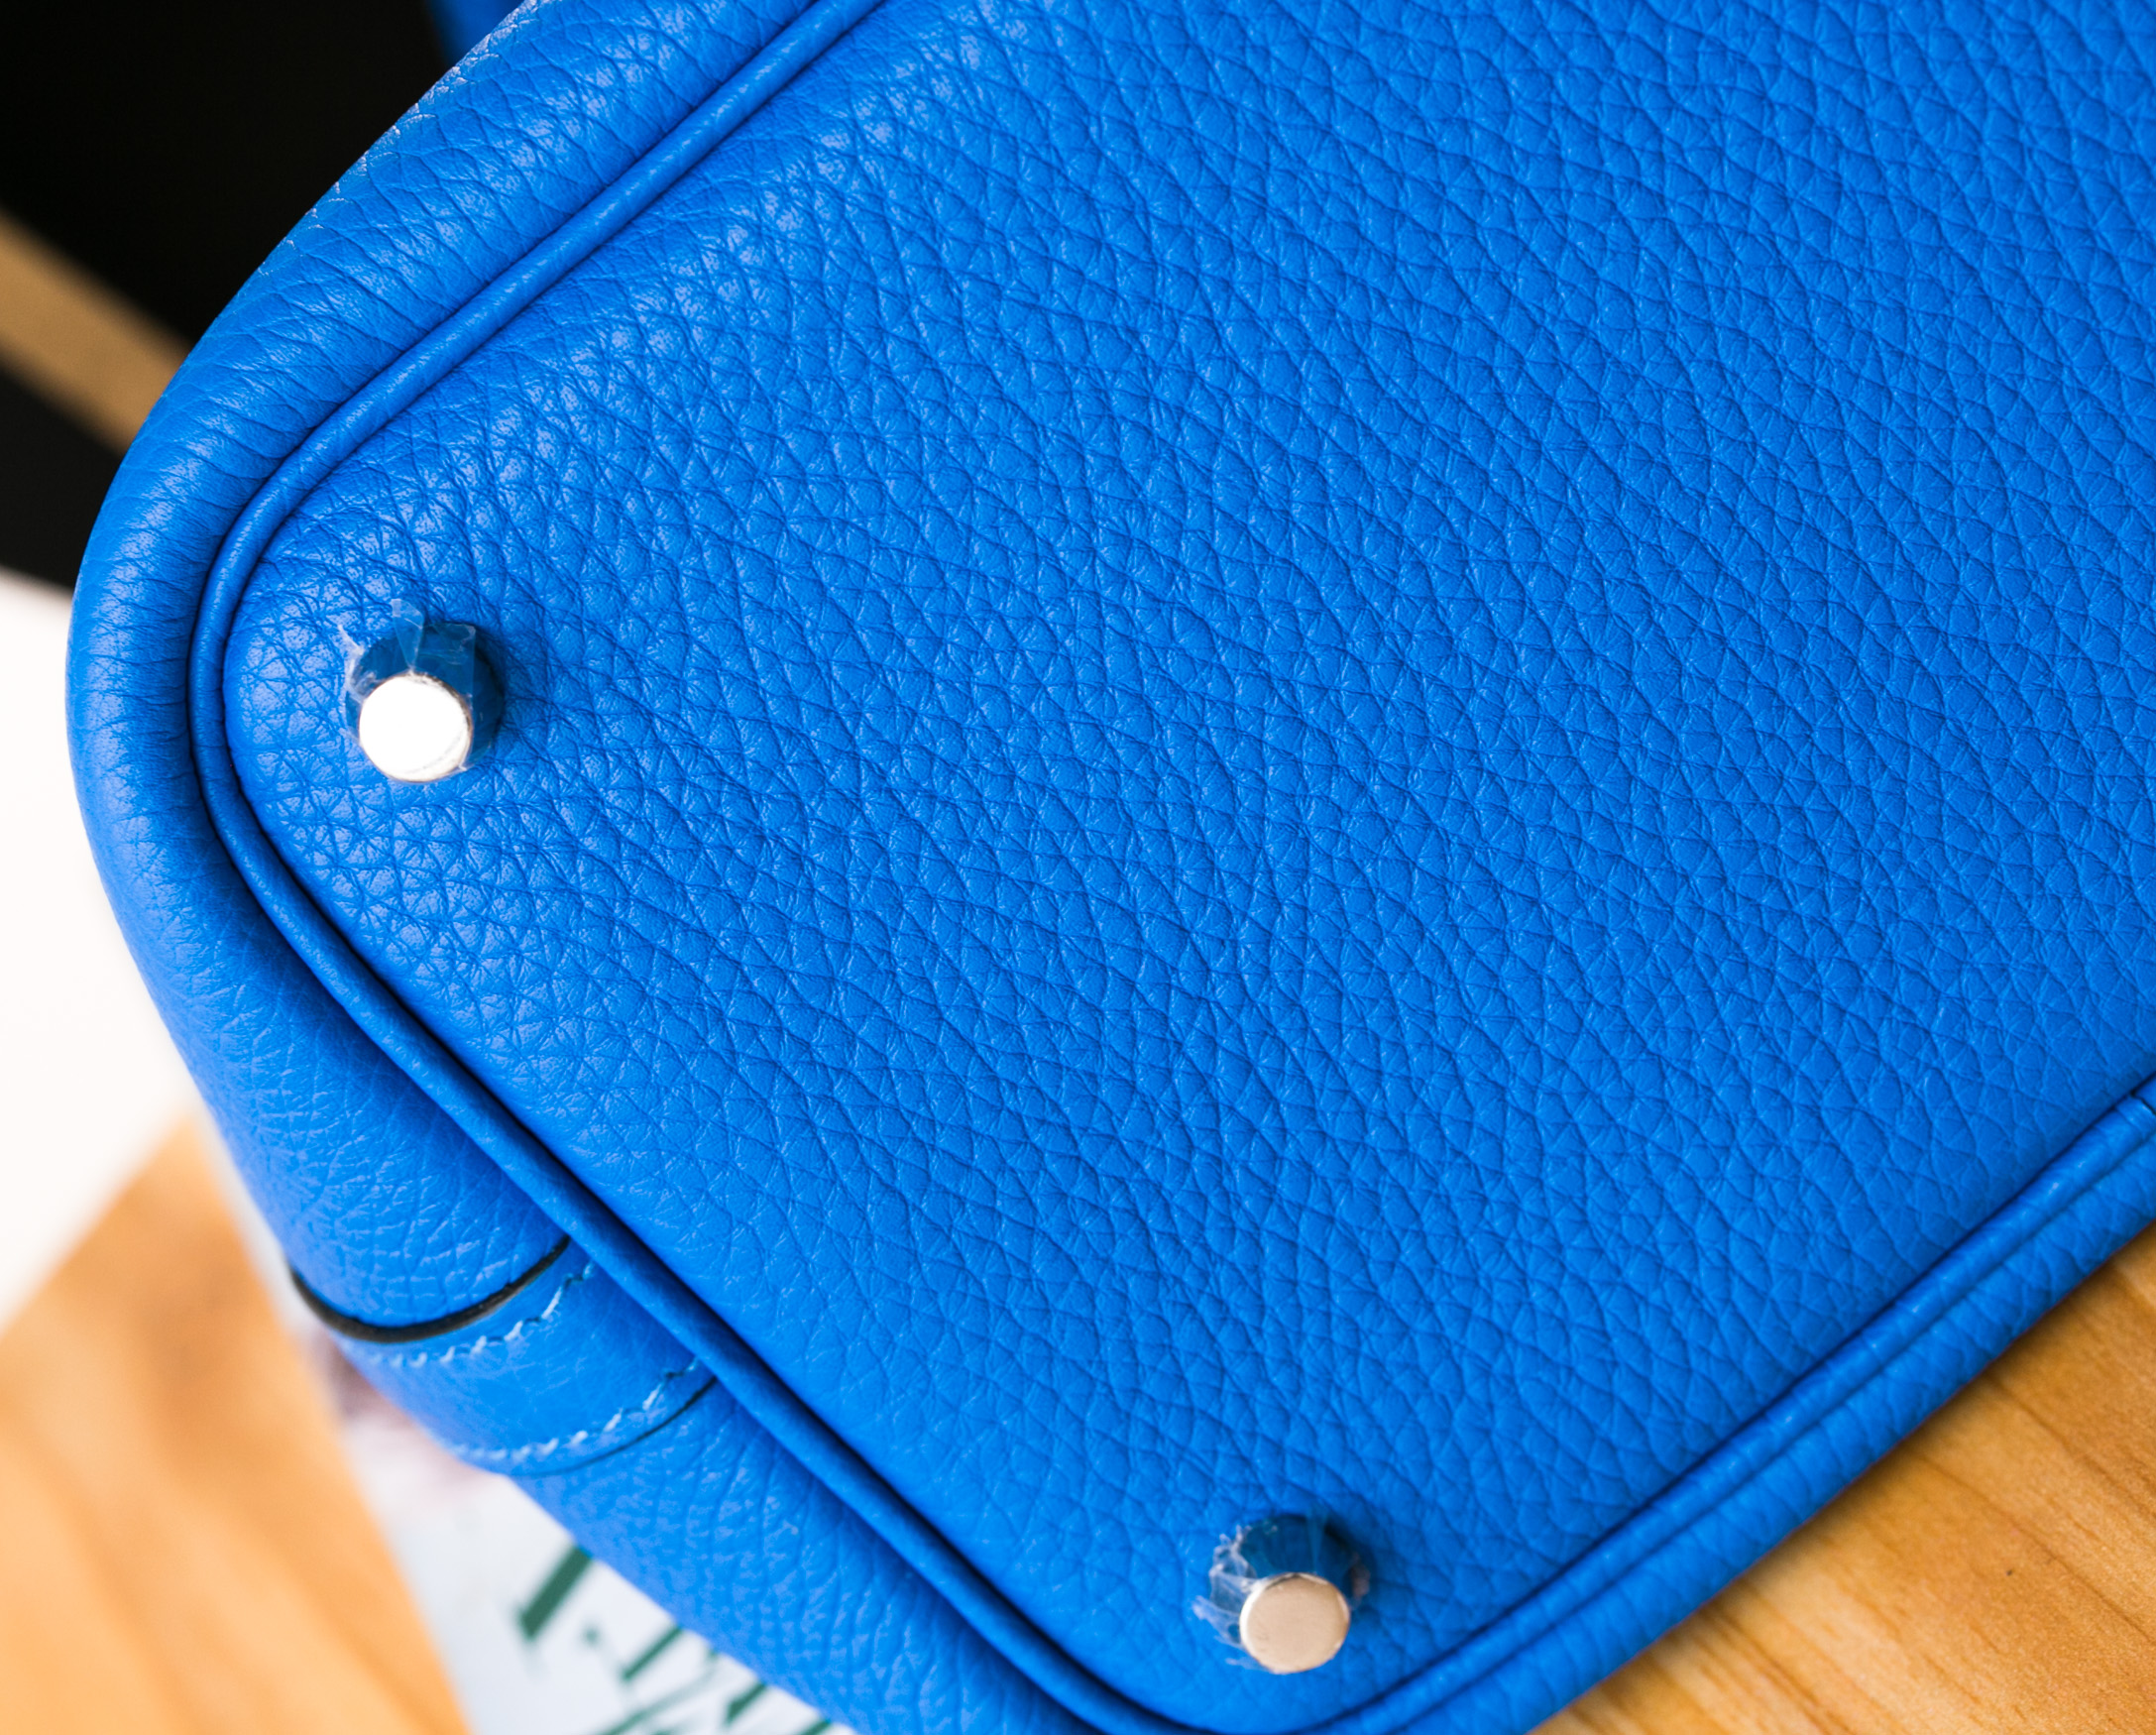 Hermes新款女包 爱马仕B3坦桑尼亚蓝原厂TC牛皮Picotin菜篮子包22cm